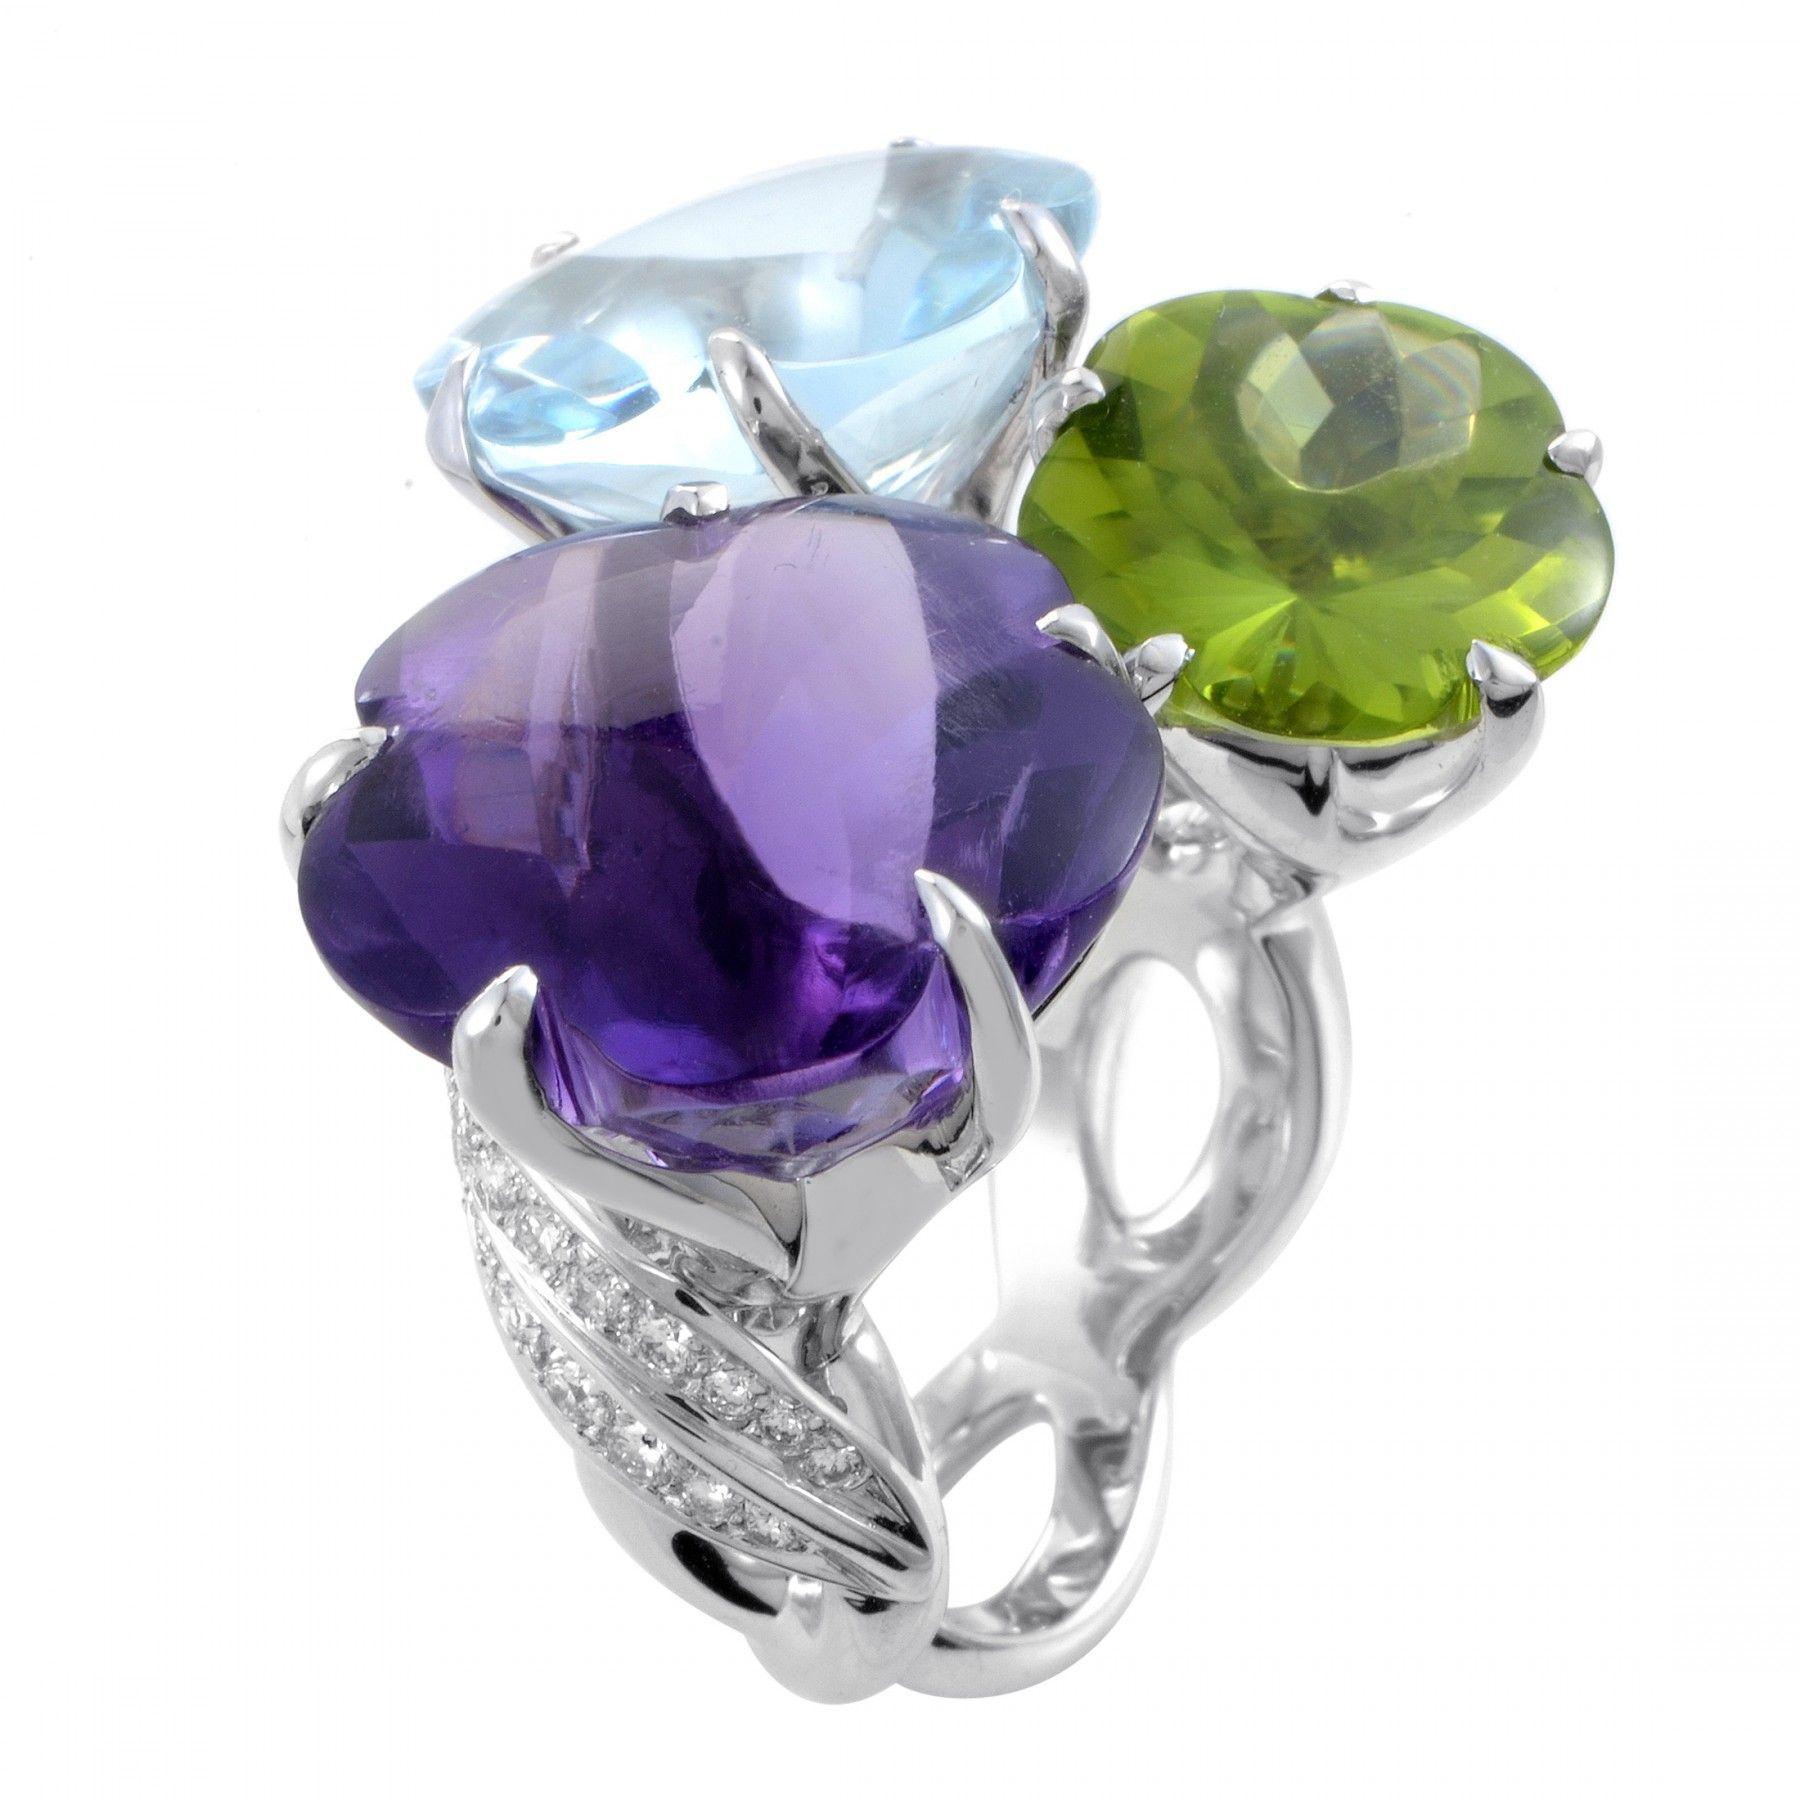 Chanel Camelia Women's 18K White Gold Diamond & Triple Gemstone Flower Cocktail Ring